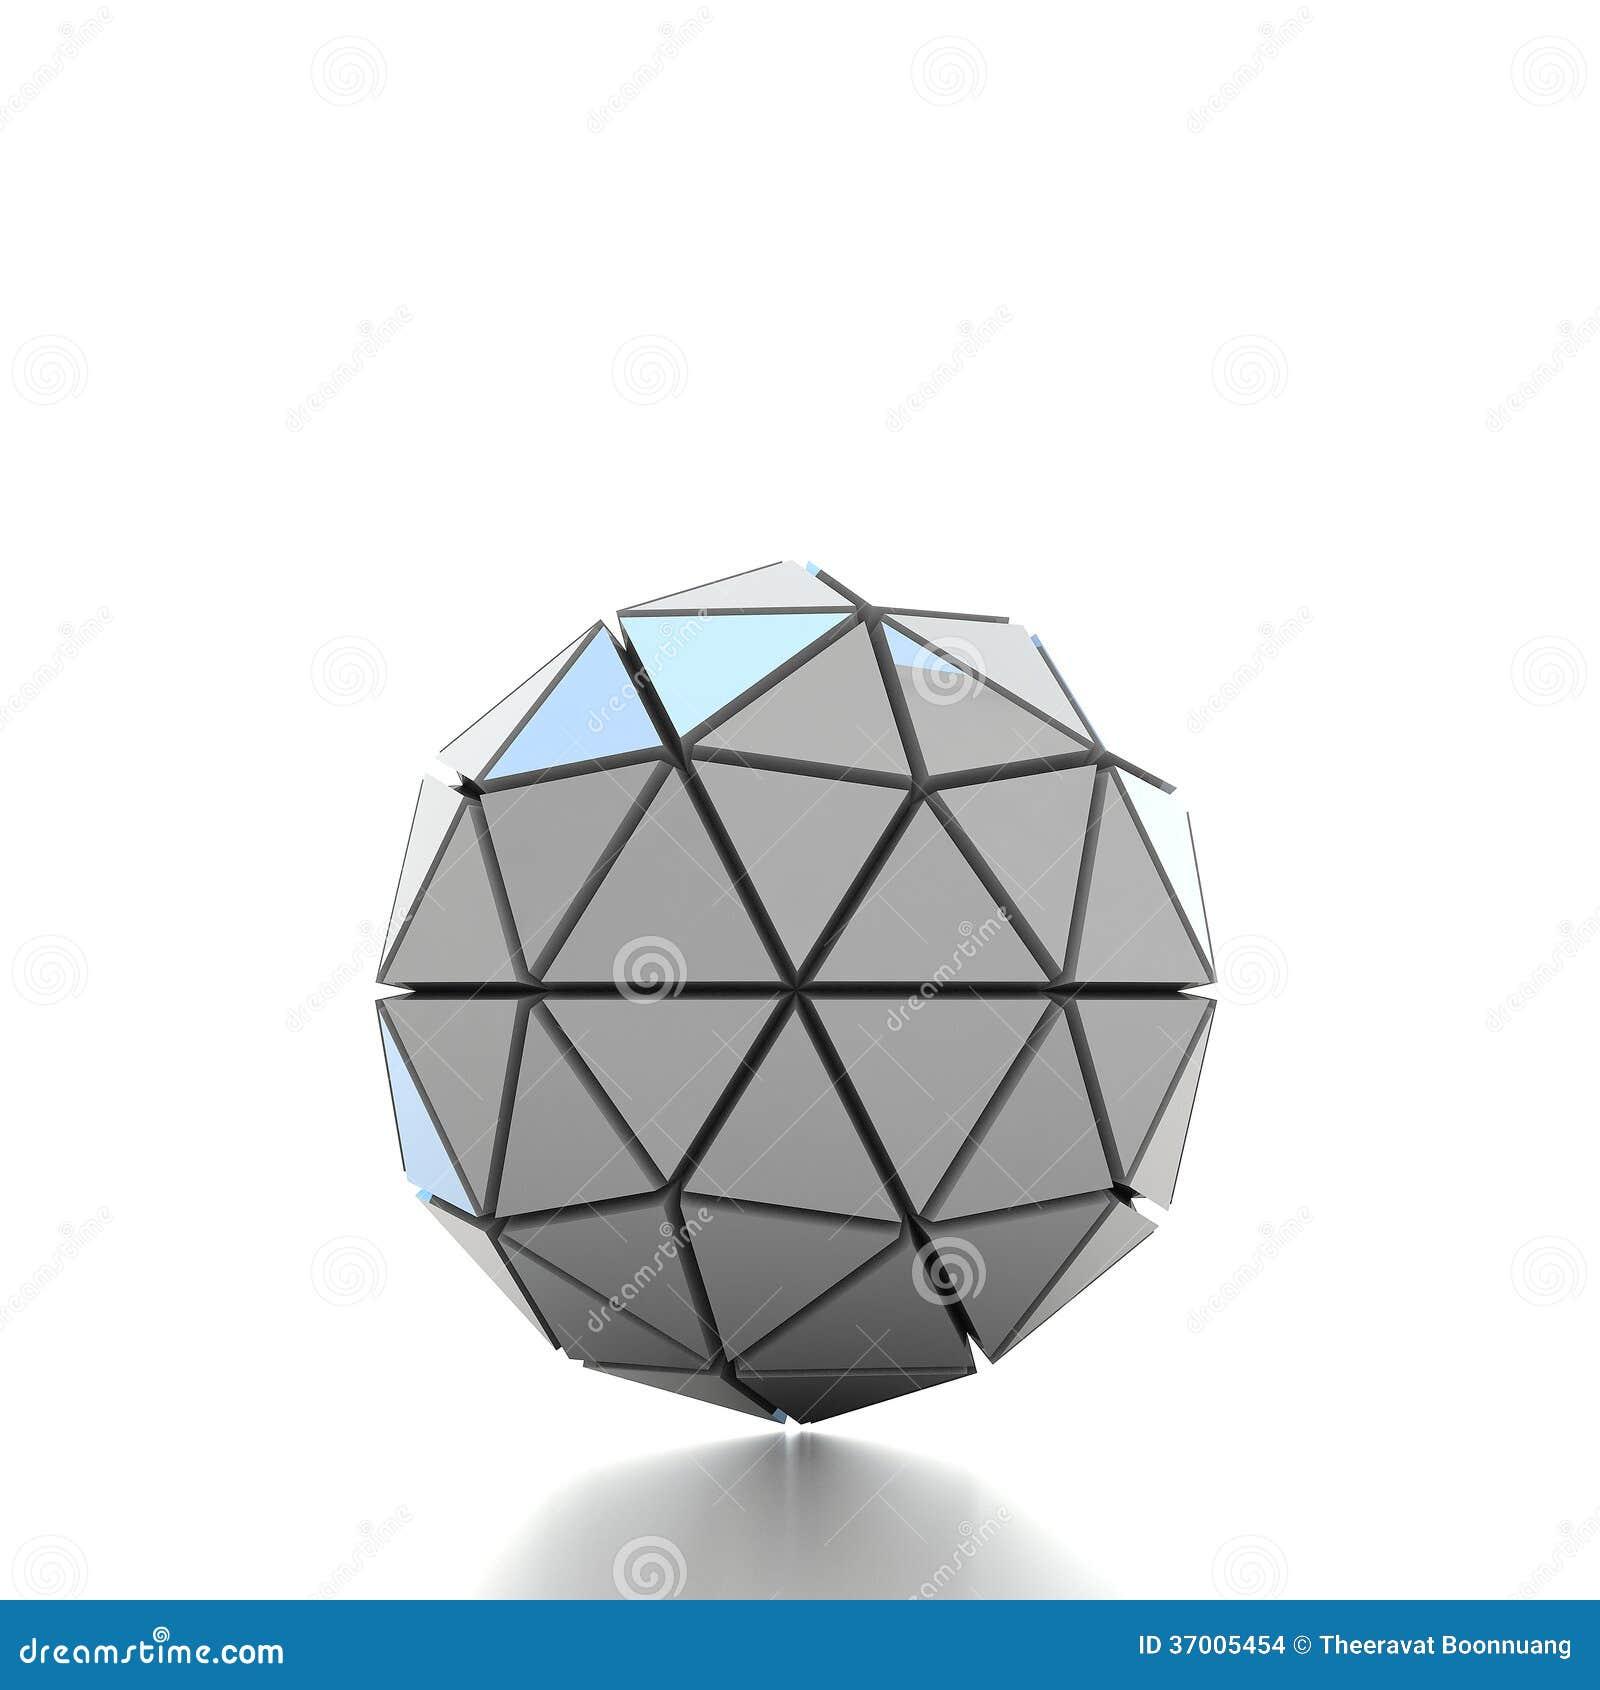 grundlegende geometrische formen der illustration 3d stock abbildung bild 37005454. Black Bedroom Furniture Sets. Home Design Ideas